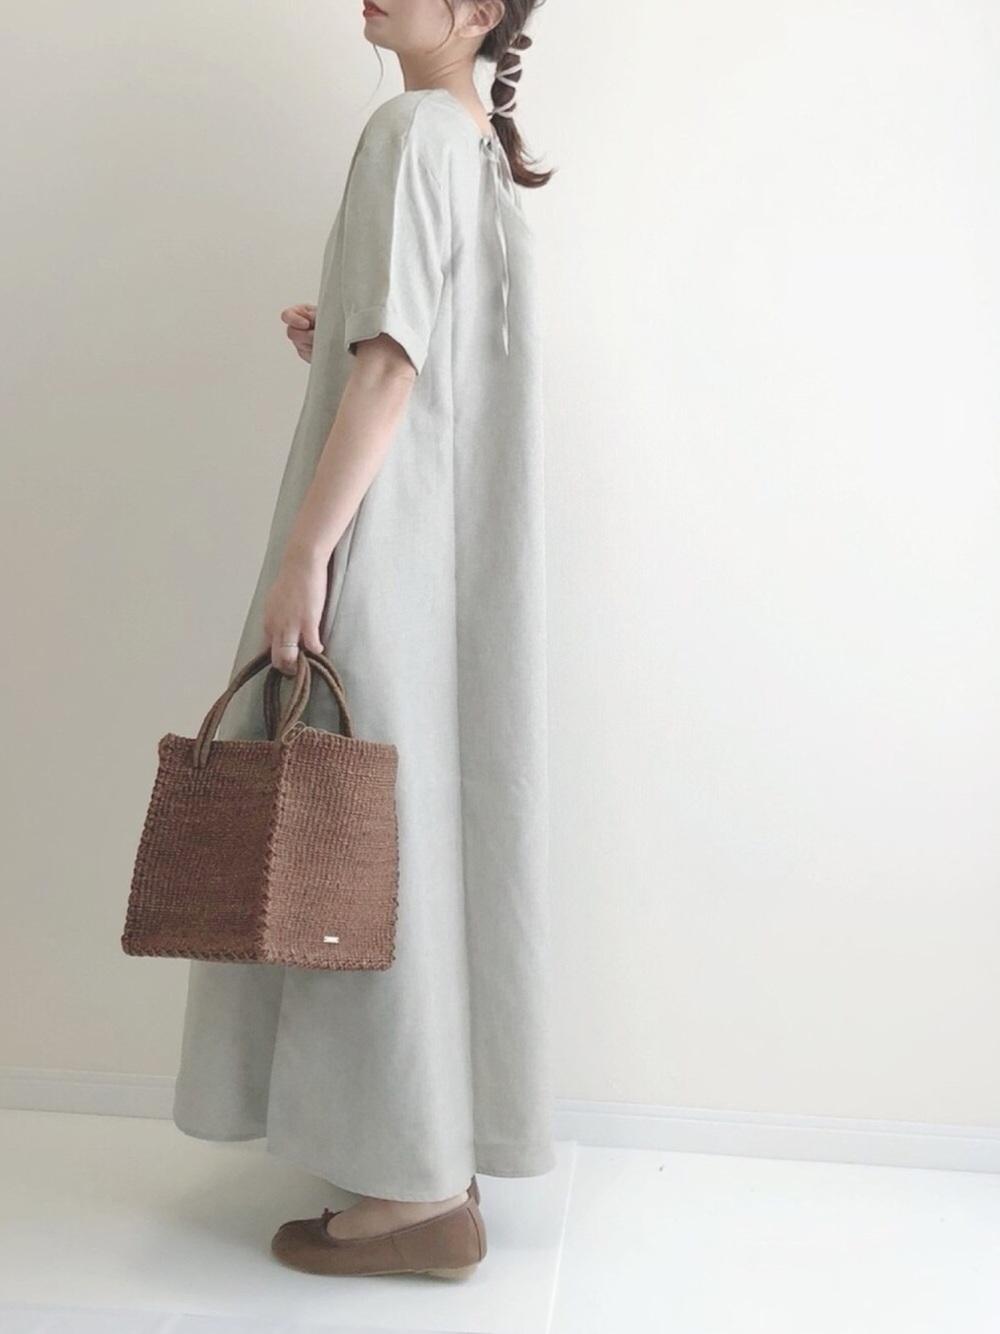 titivateのベージュのワンピースを着た女性